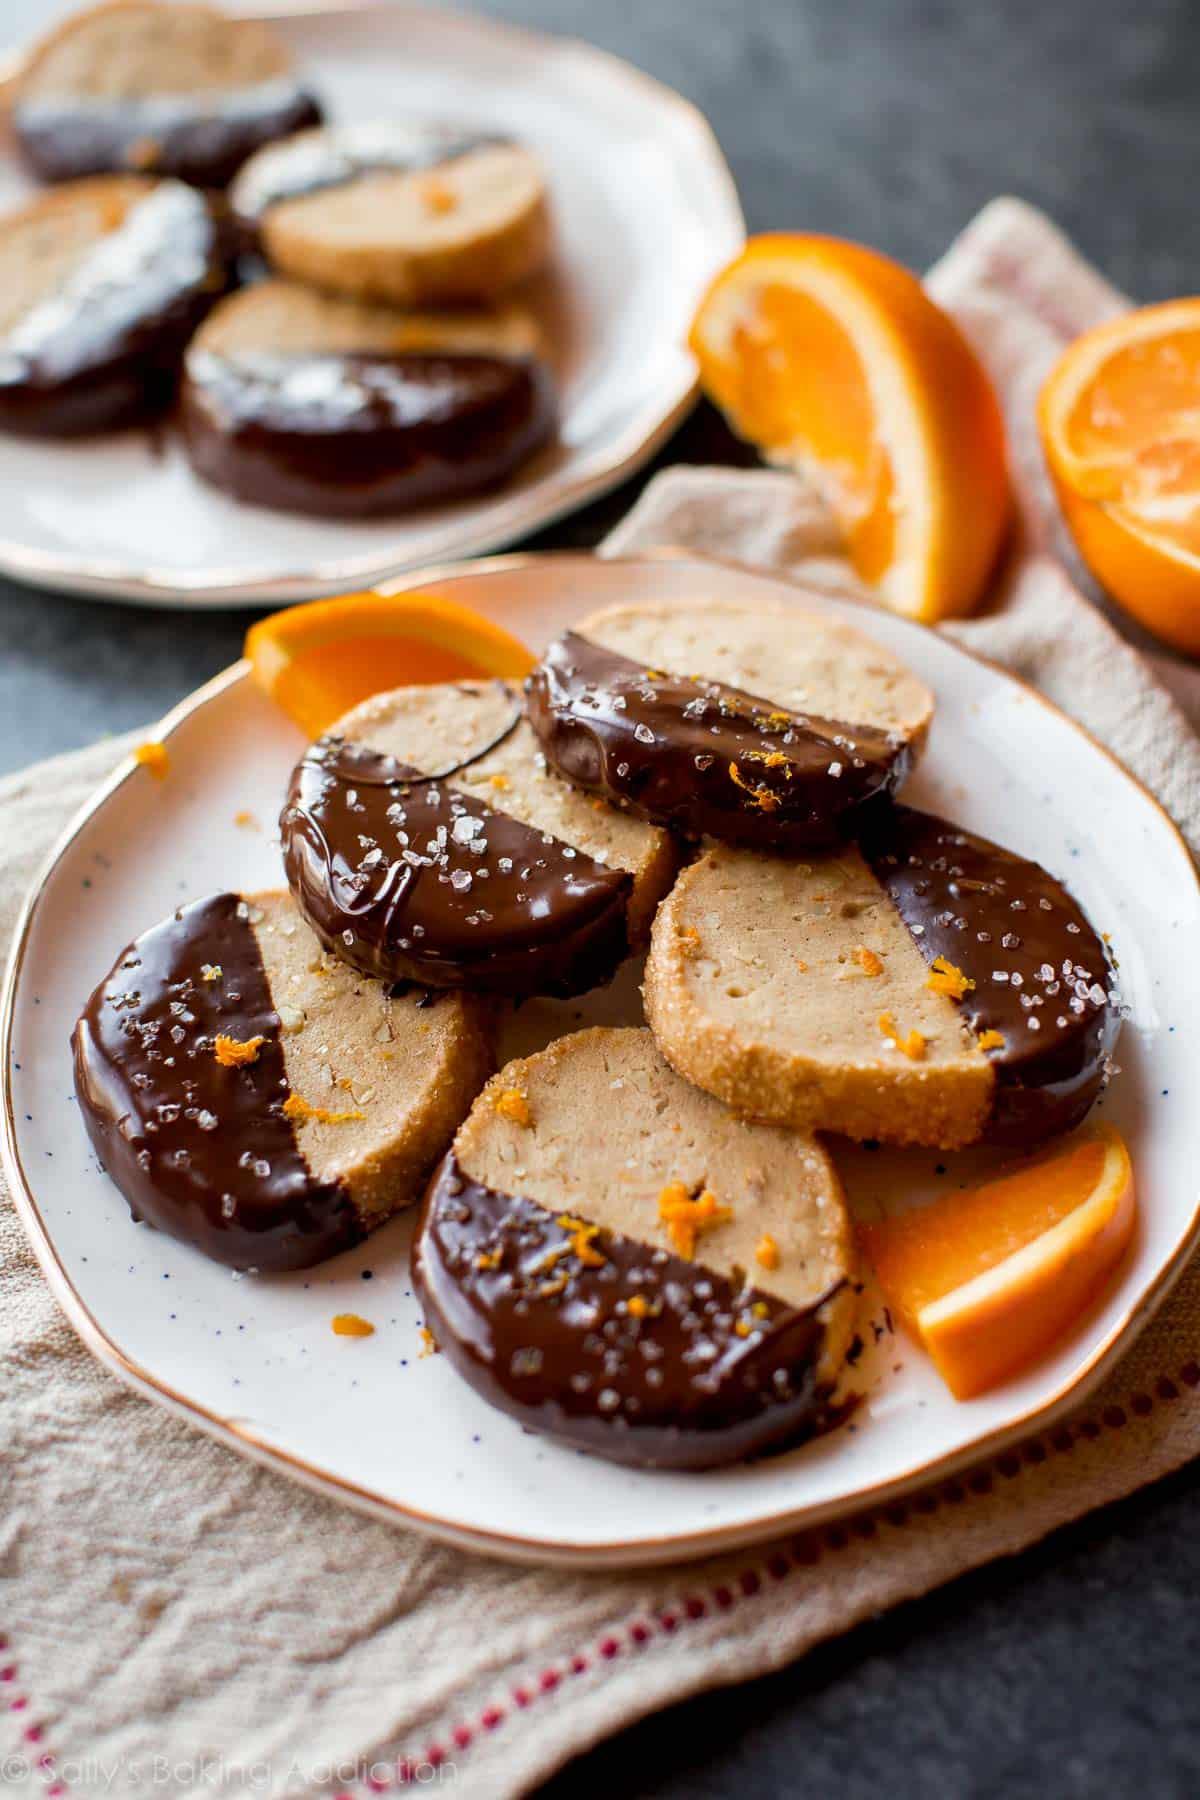 Dark Chocolate Orange Slice & Bake Cookies - Sallys Baking Addiction